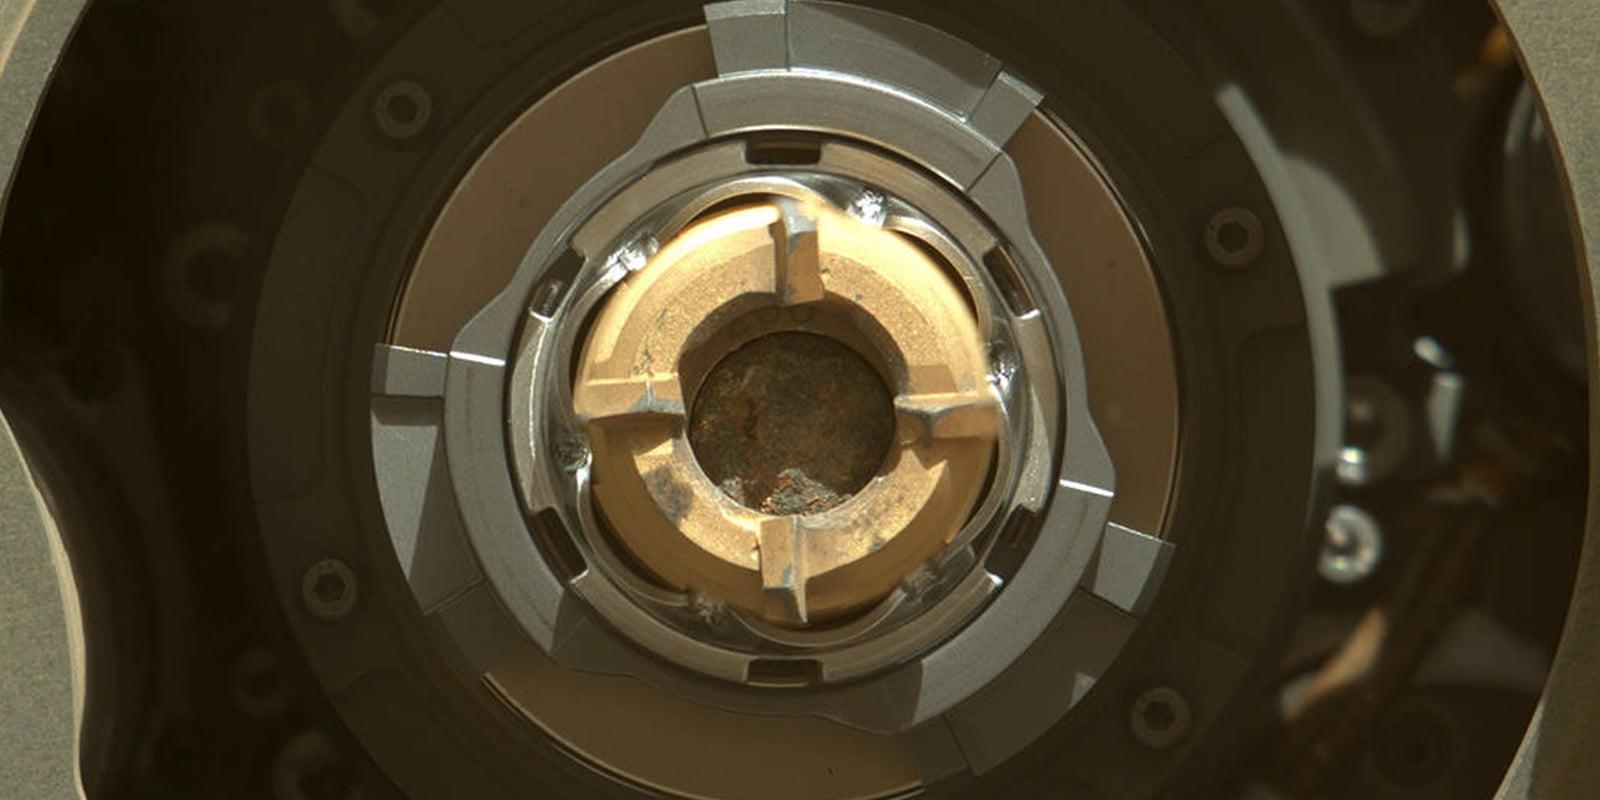 NASA confirms Perseverance rover's first Mars rock sample